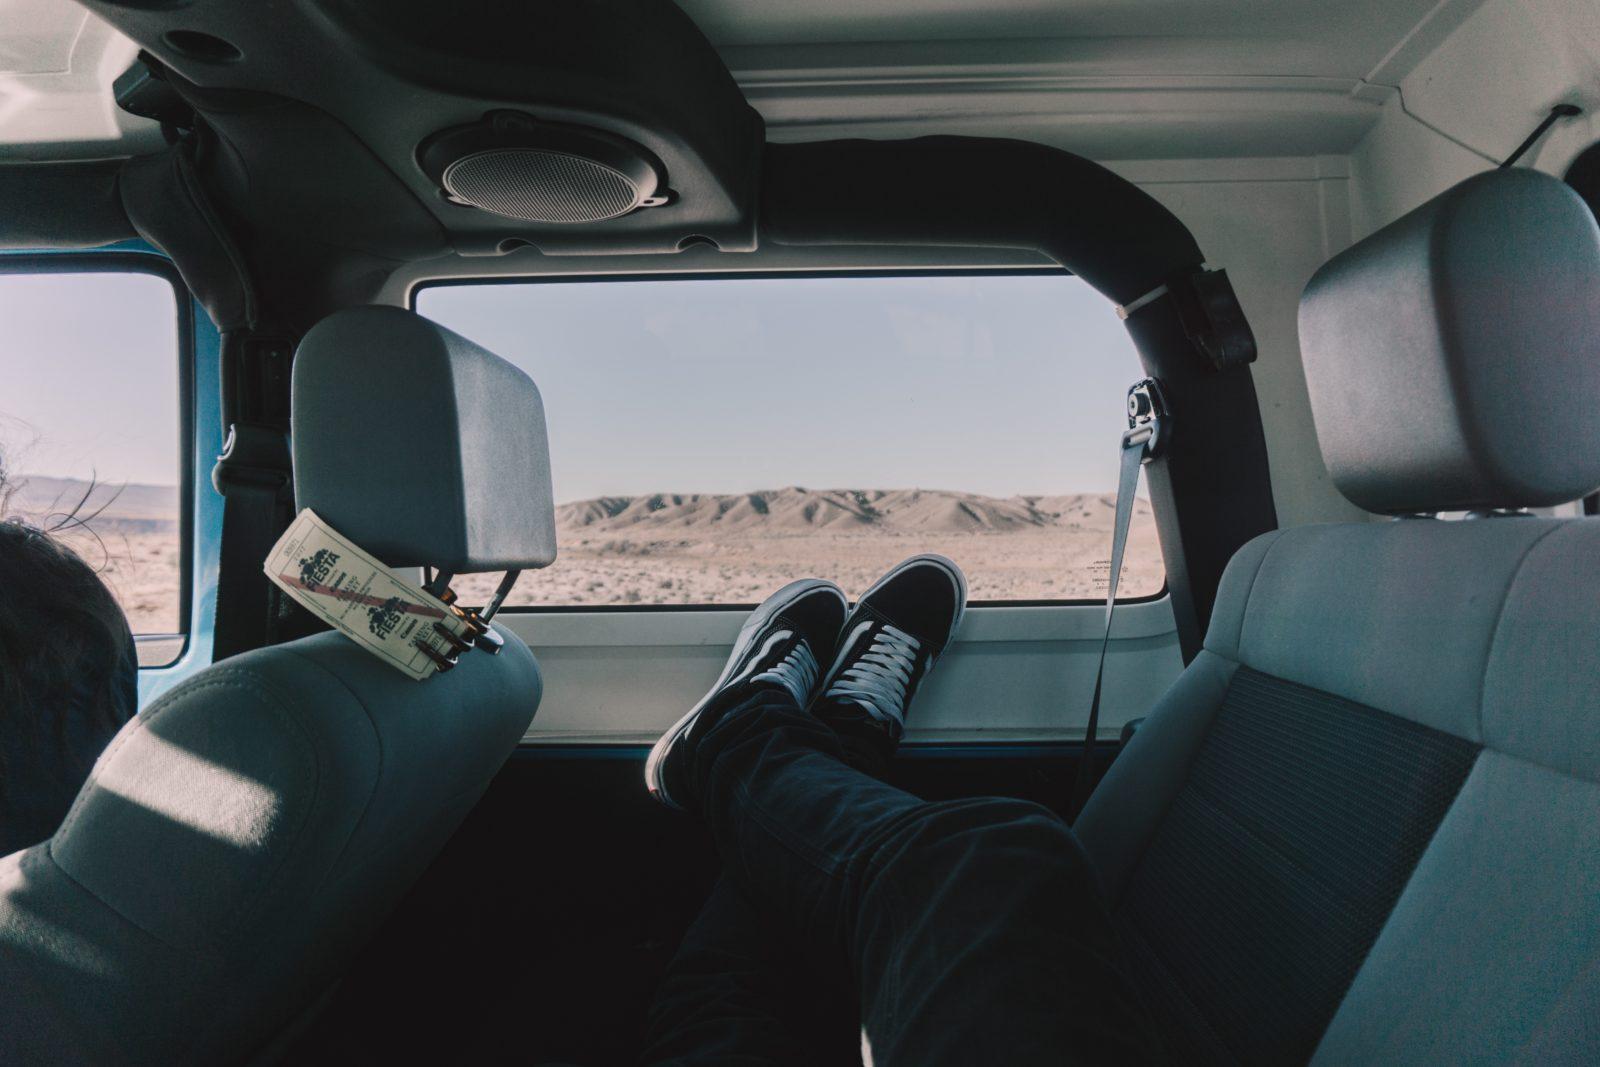 autositze reinigen lassen. Black Bedroom Furniture Sets. Home Design Ideas